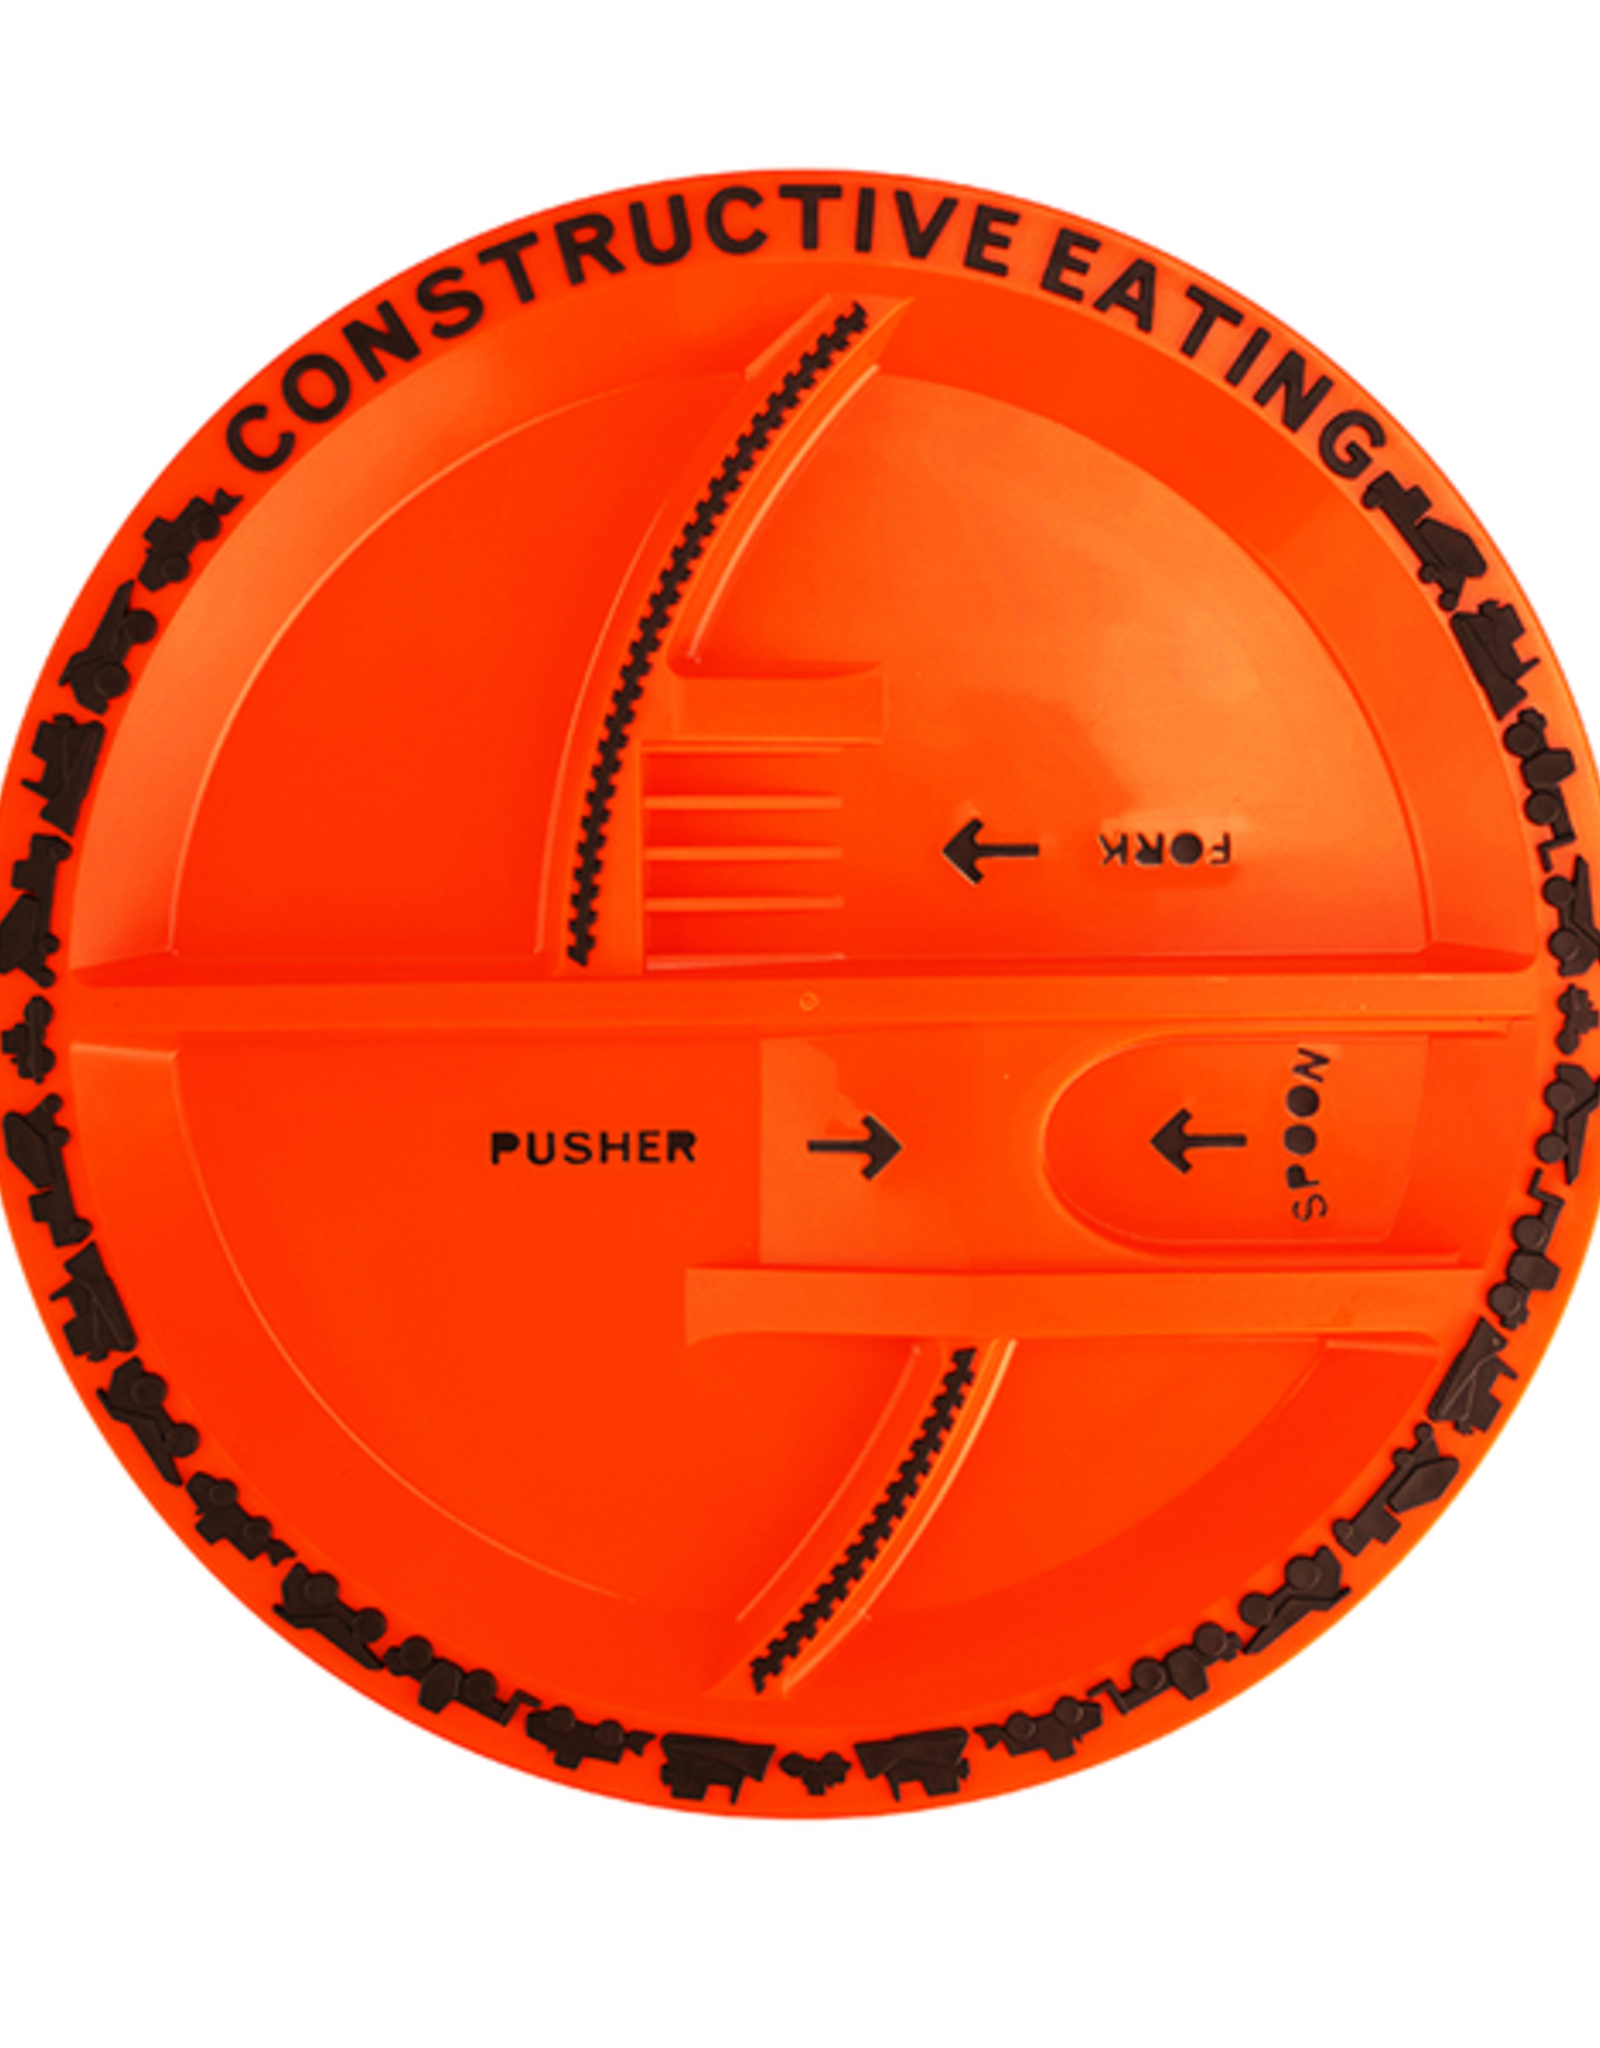 Construction Plate